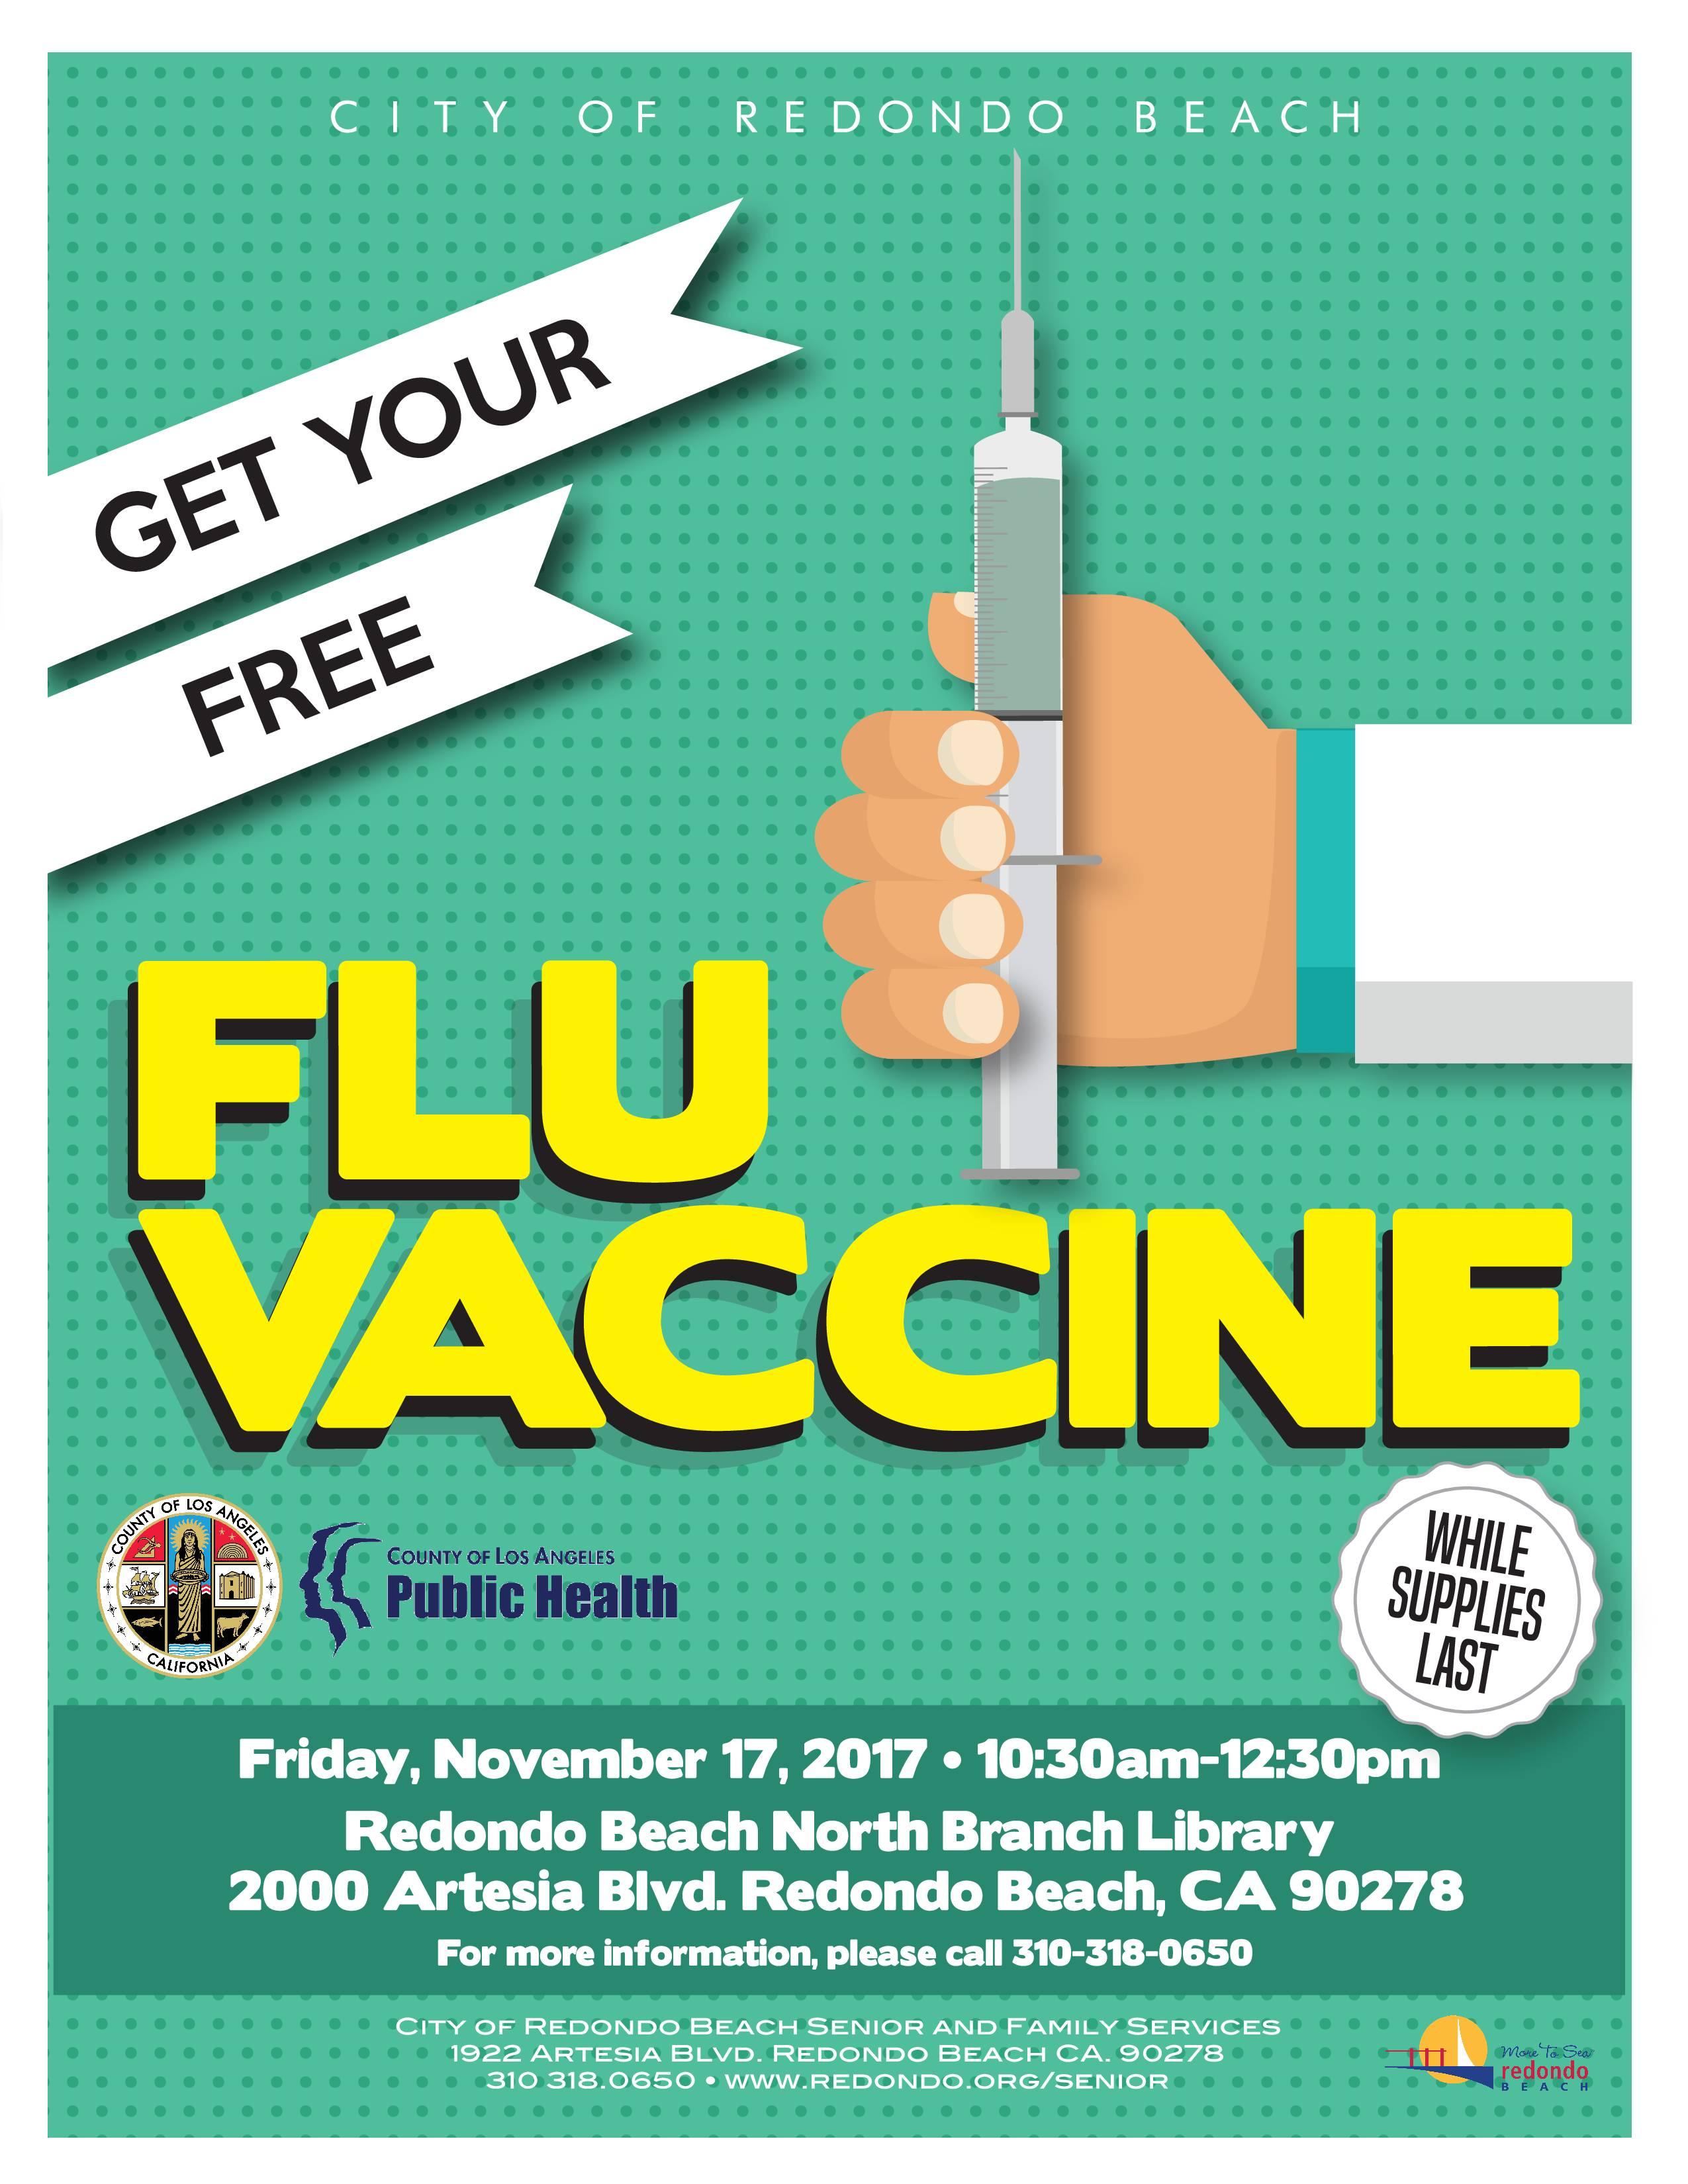 Flu Vaccine Flyers Free: Get Your FREE Flu Vaccine